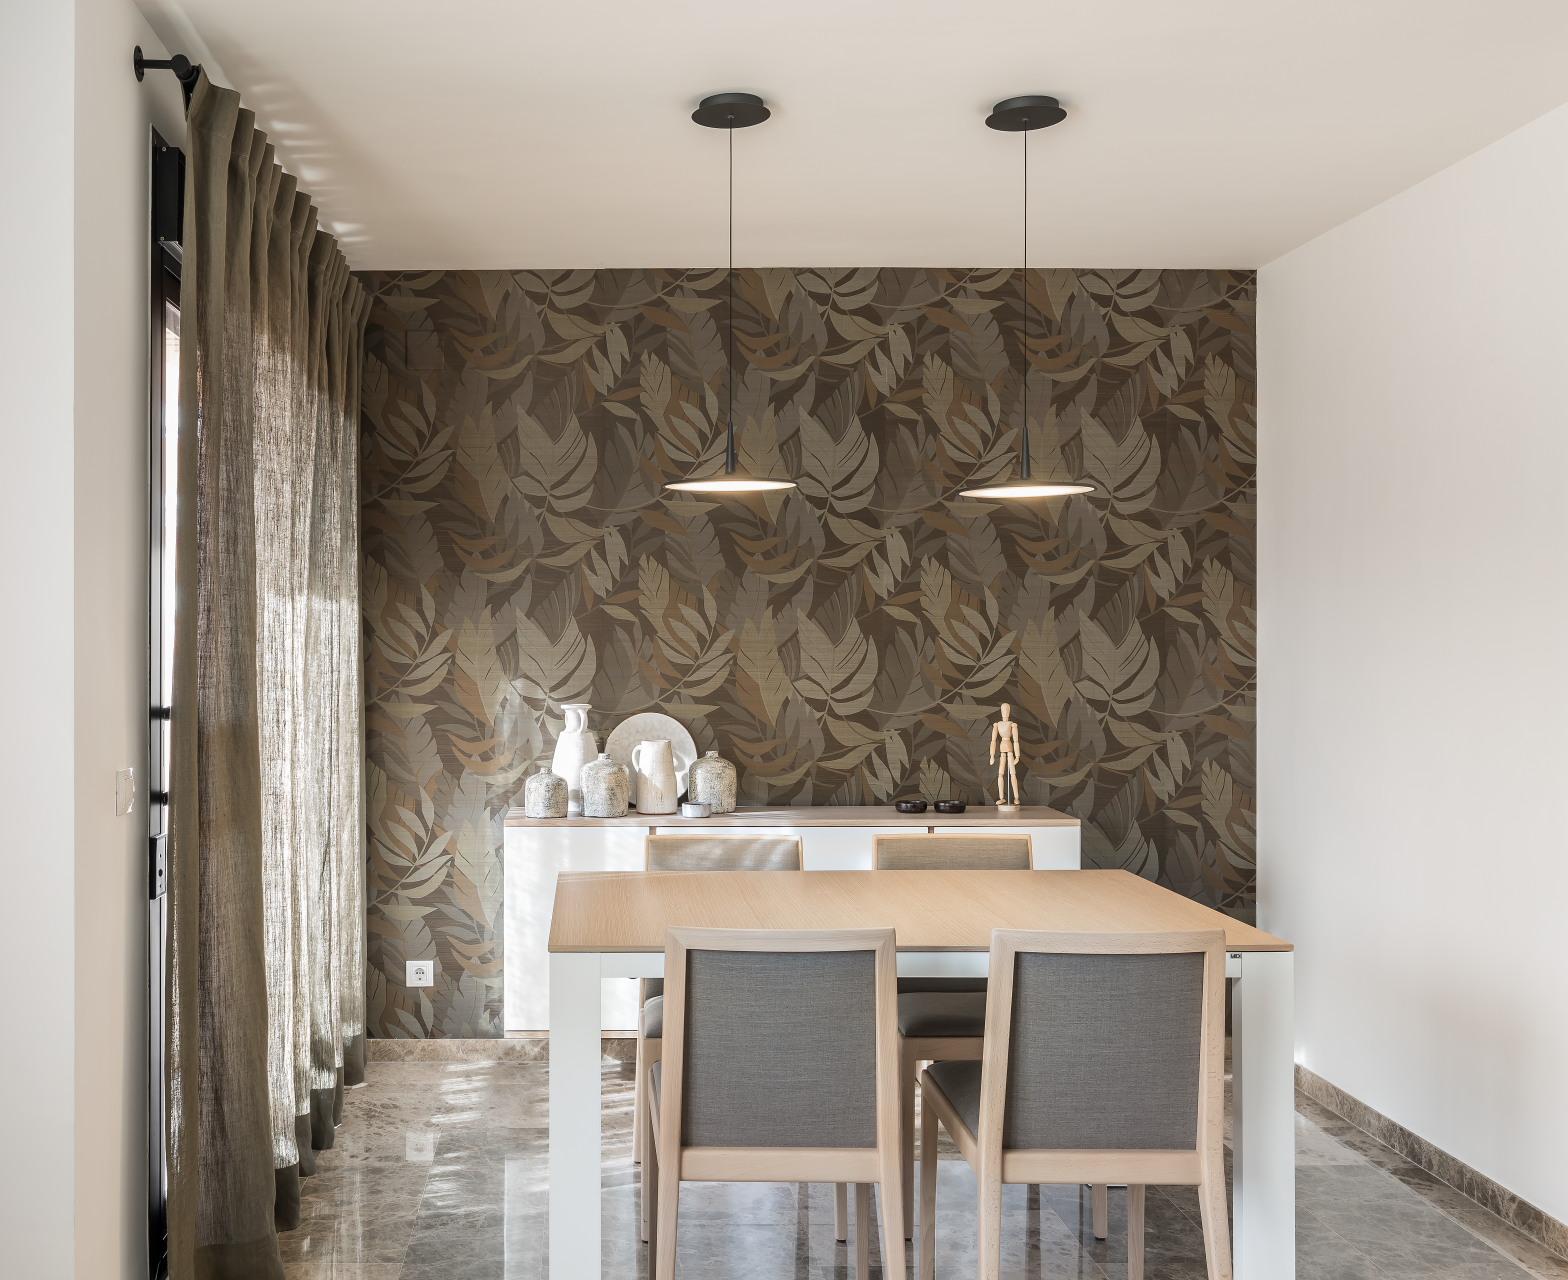 fotografia-arquitectura-interiorismo-valencia-german-cabo-laura-yerpes-mandas (12)